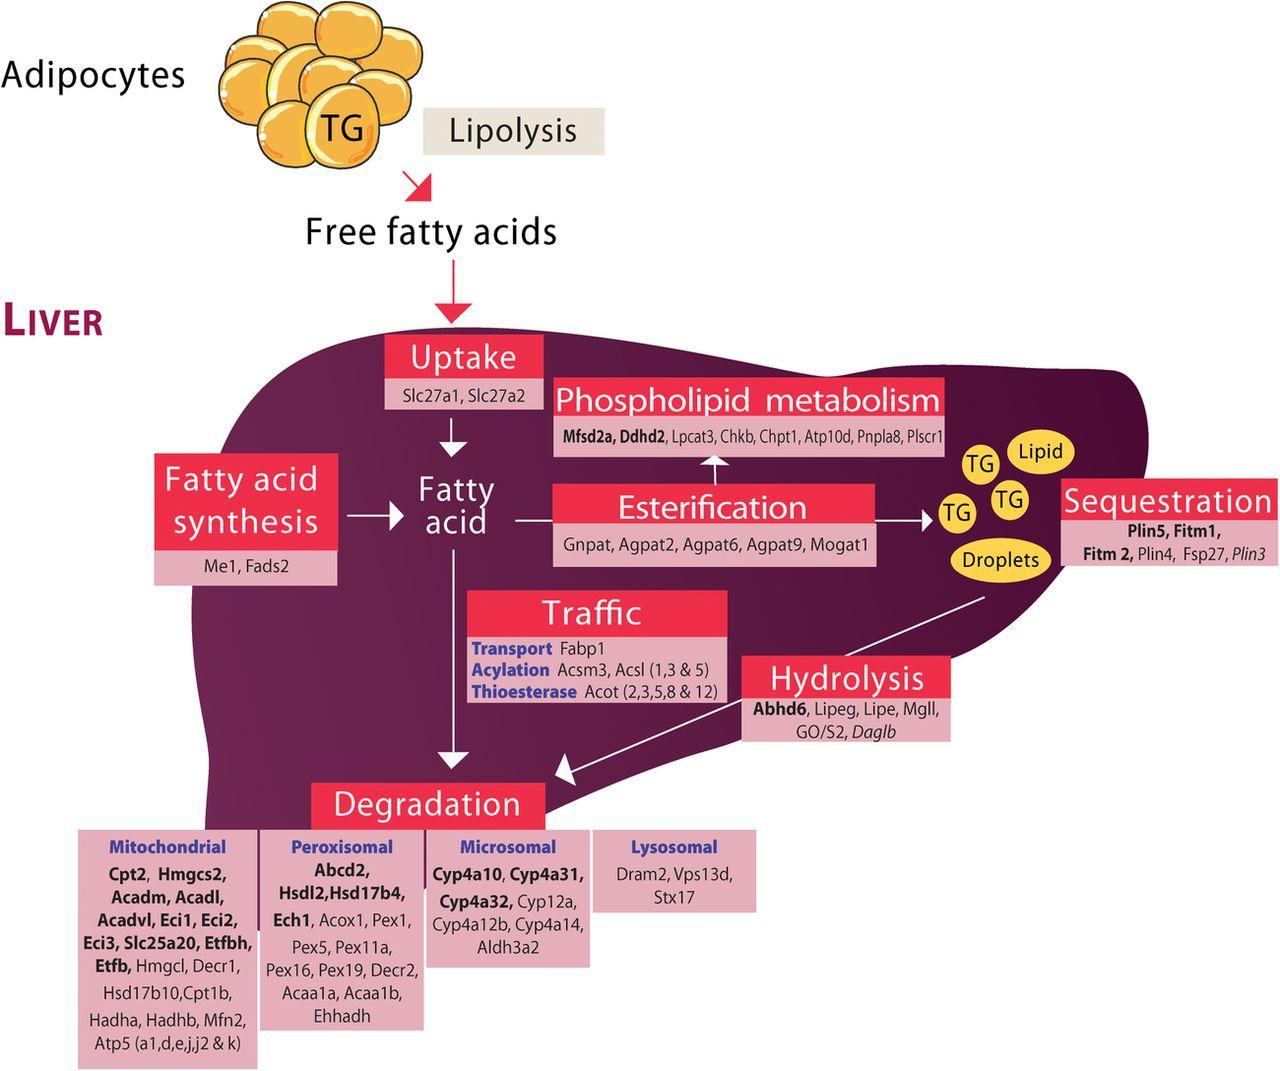 hepatic metabolism definition